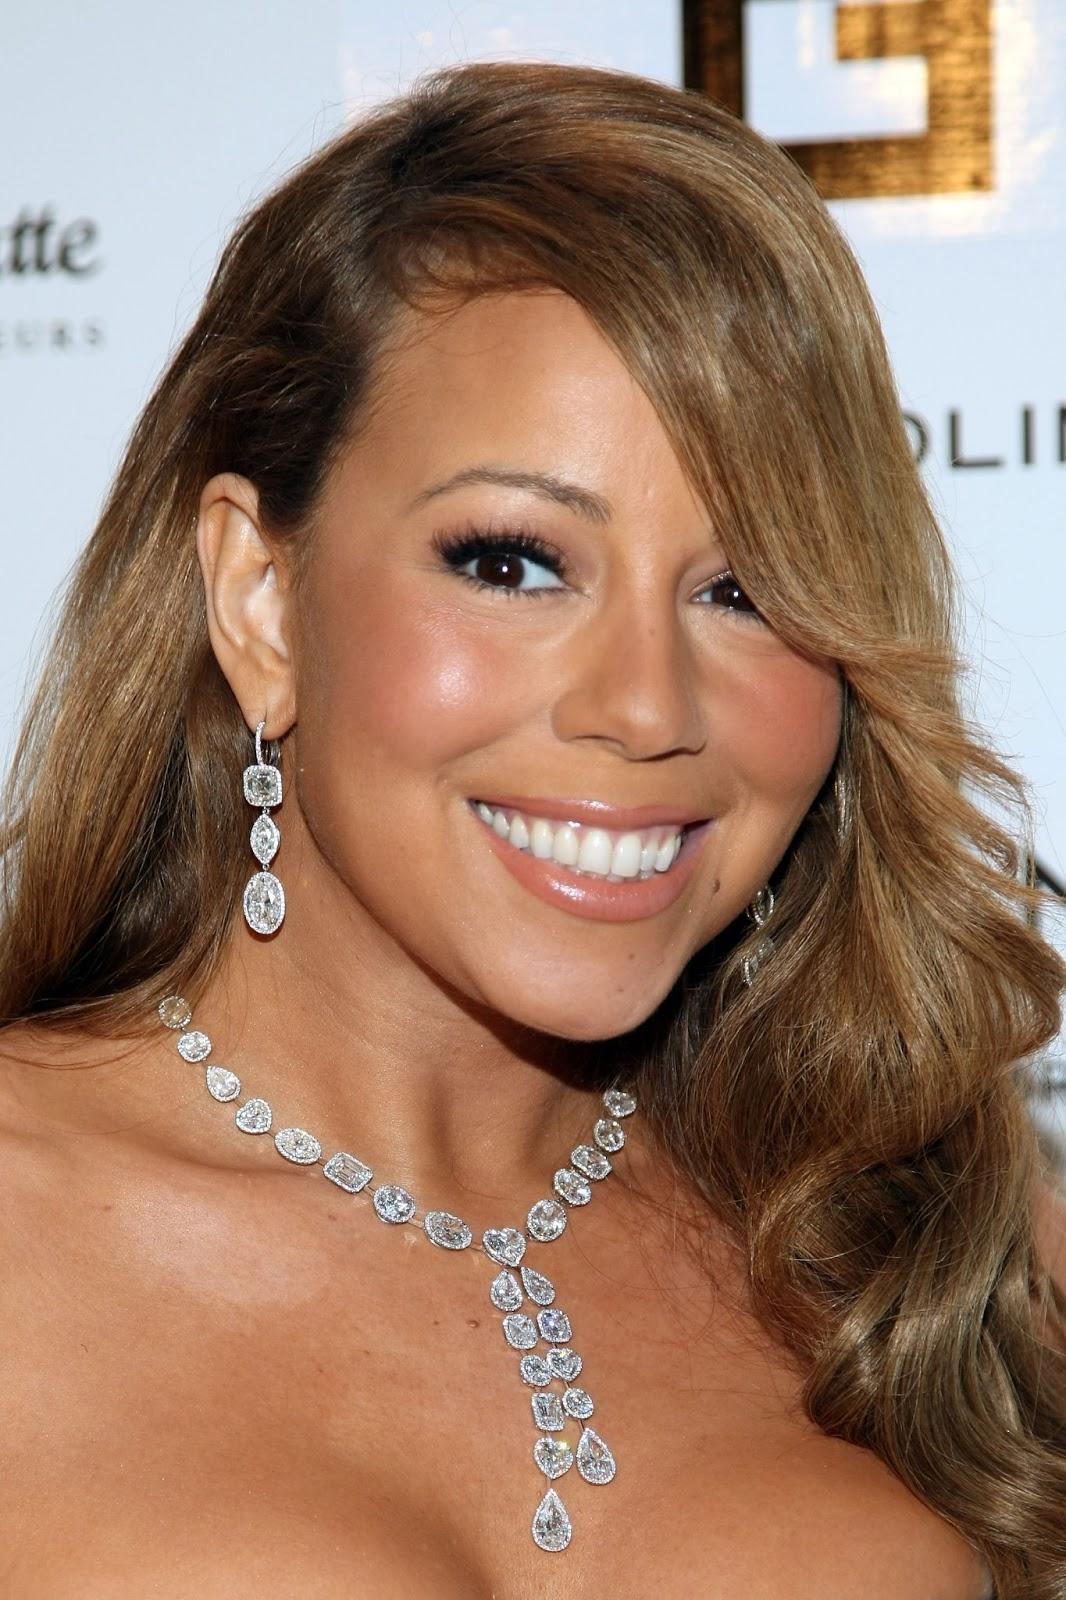 Mariah Carey: Mariah Carey Eyes Mariah Carey